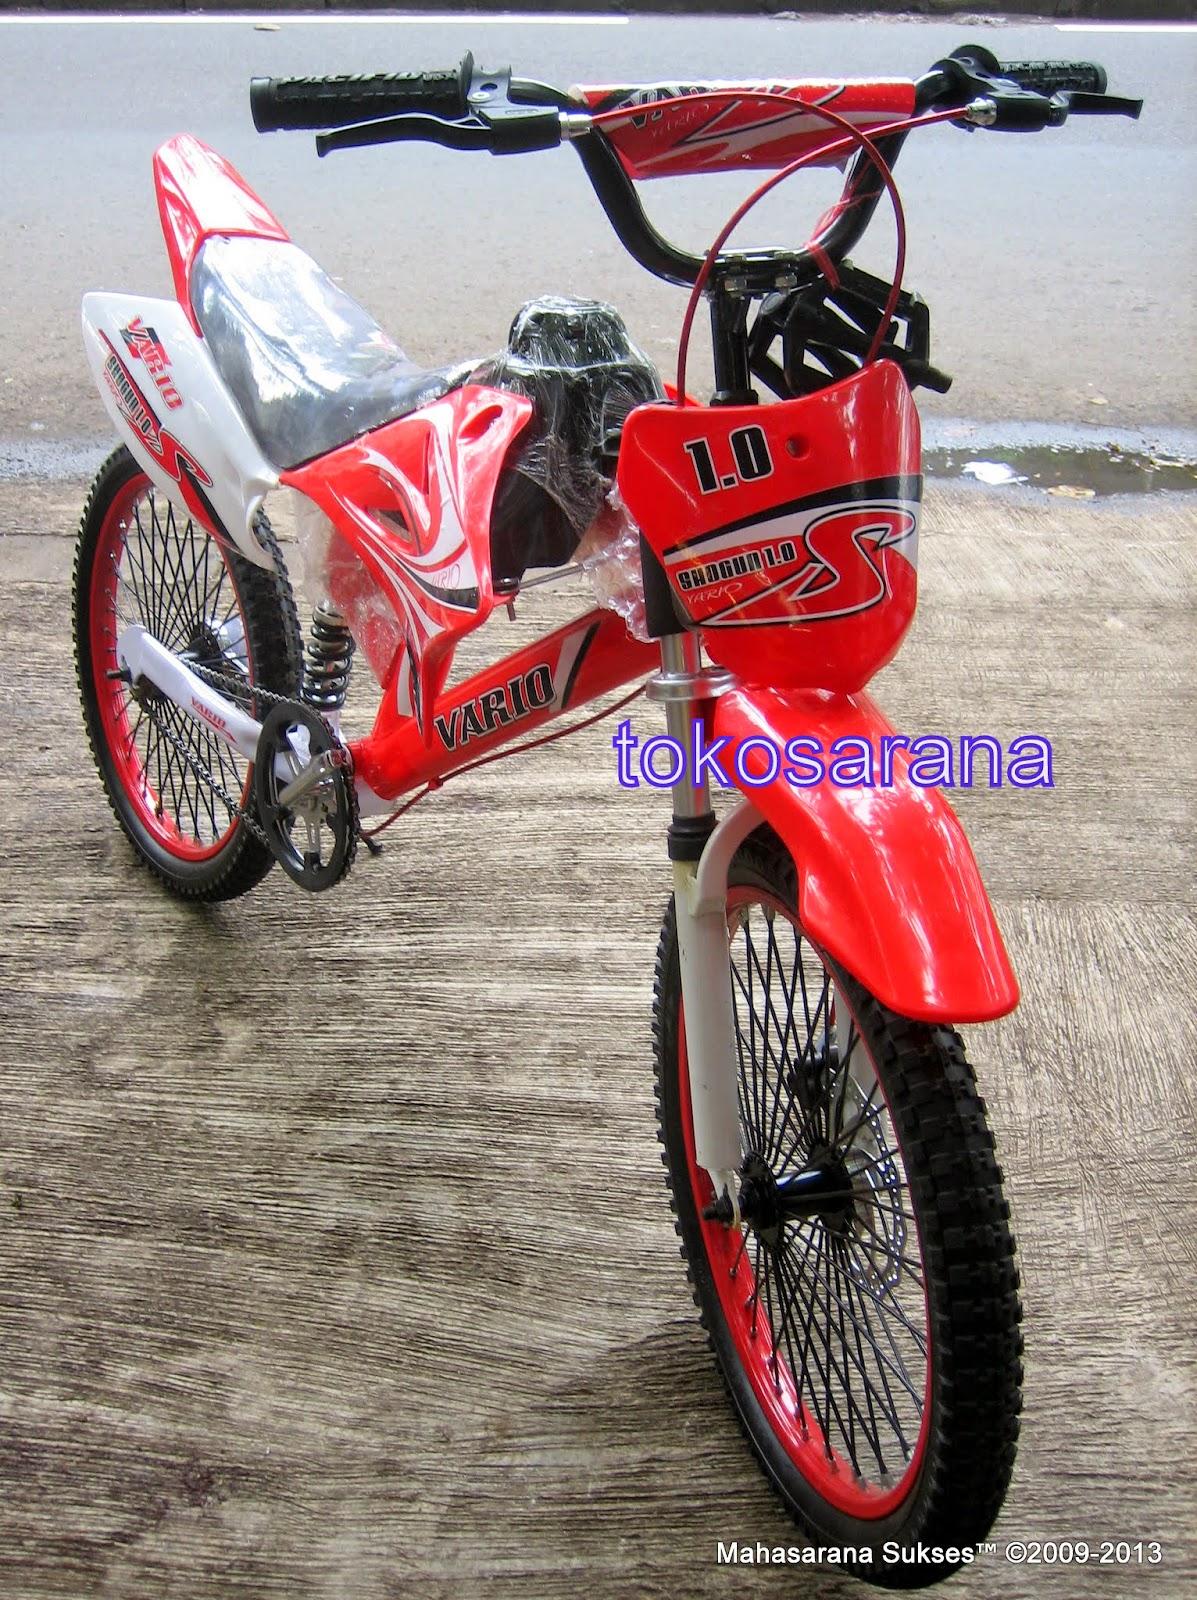 tokosarana™   Mahasarana Sukses™: Sepeda BMX Vario Shogun